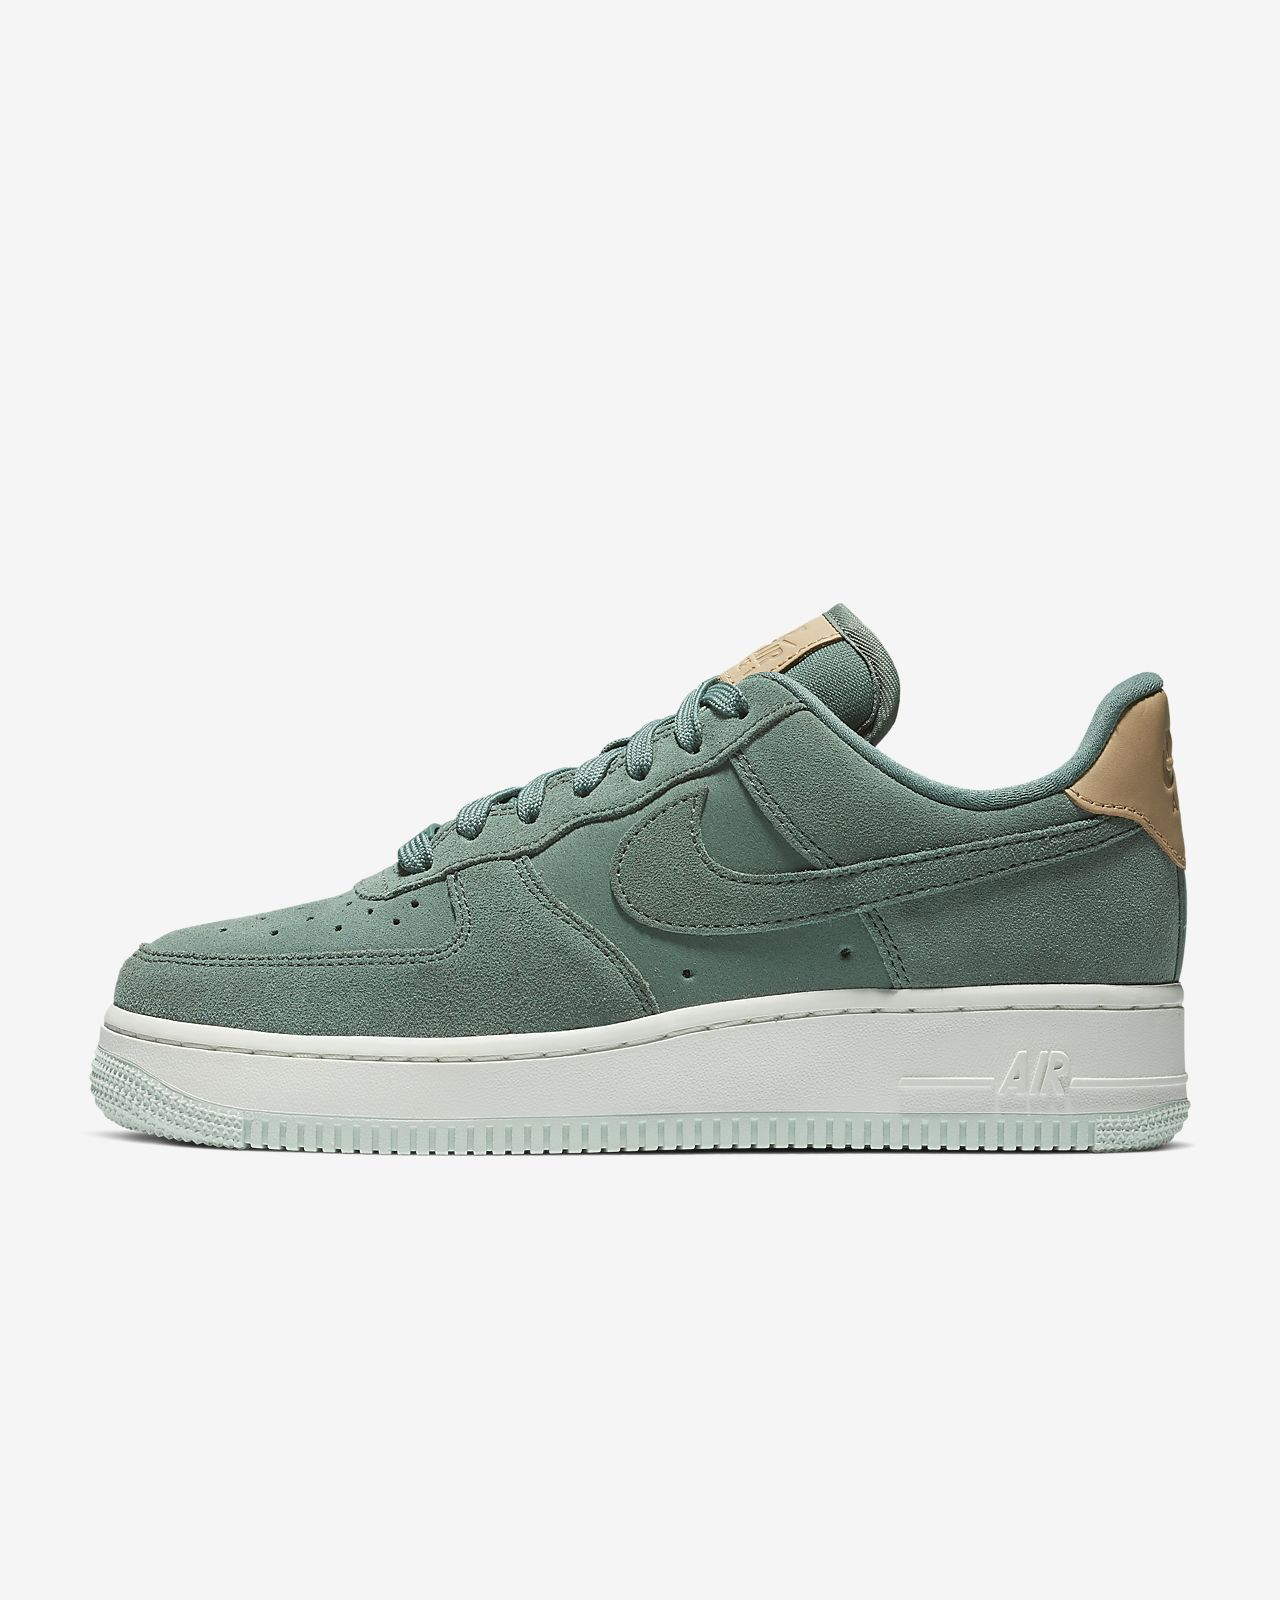 cbac970e10c Nike Air Force 1  07 Low Premium Women s Shoe. Nike.com RO